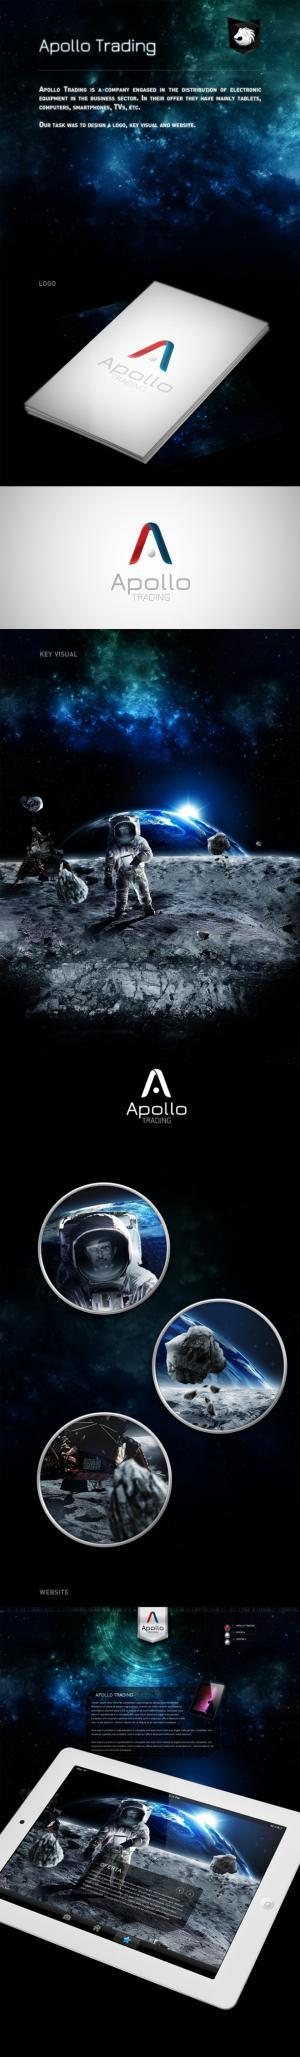 Branding dla Apollo Trading - Chełm